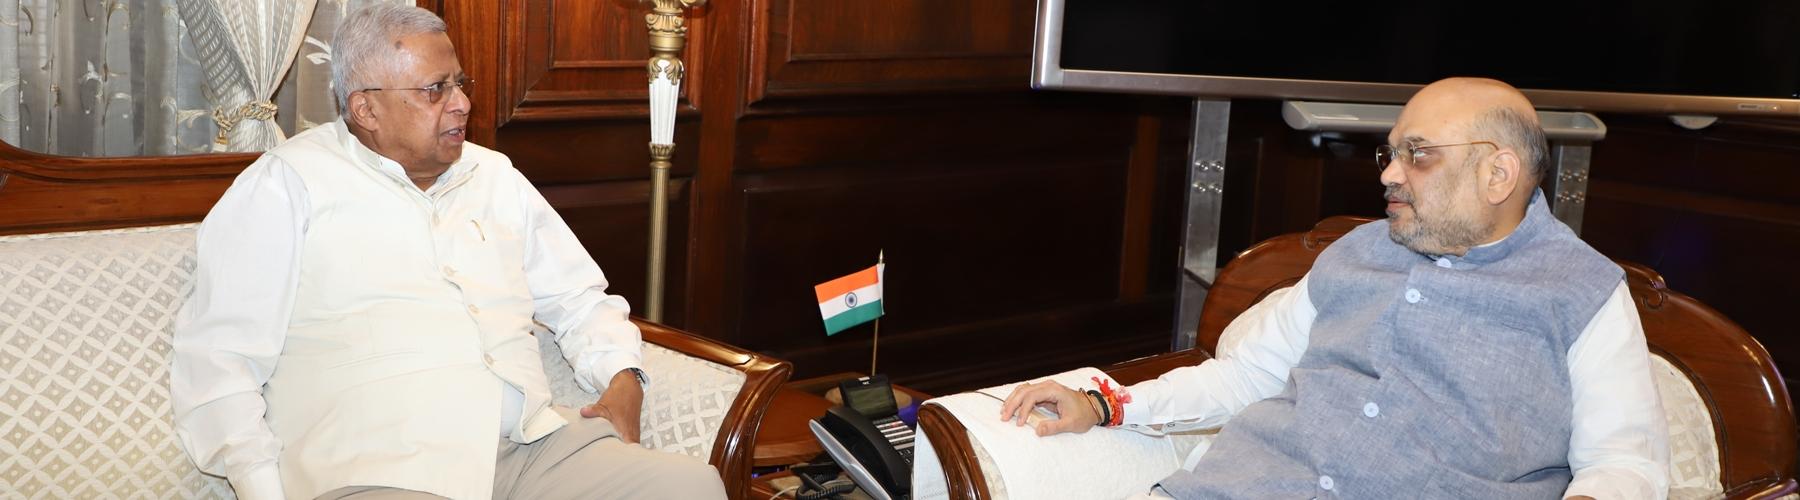 The Governor of Meghalaya Shri Tathagata Roy calling upon Union Home Minister Shri Amit Shah in New Delhi on June 14, 2019.